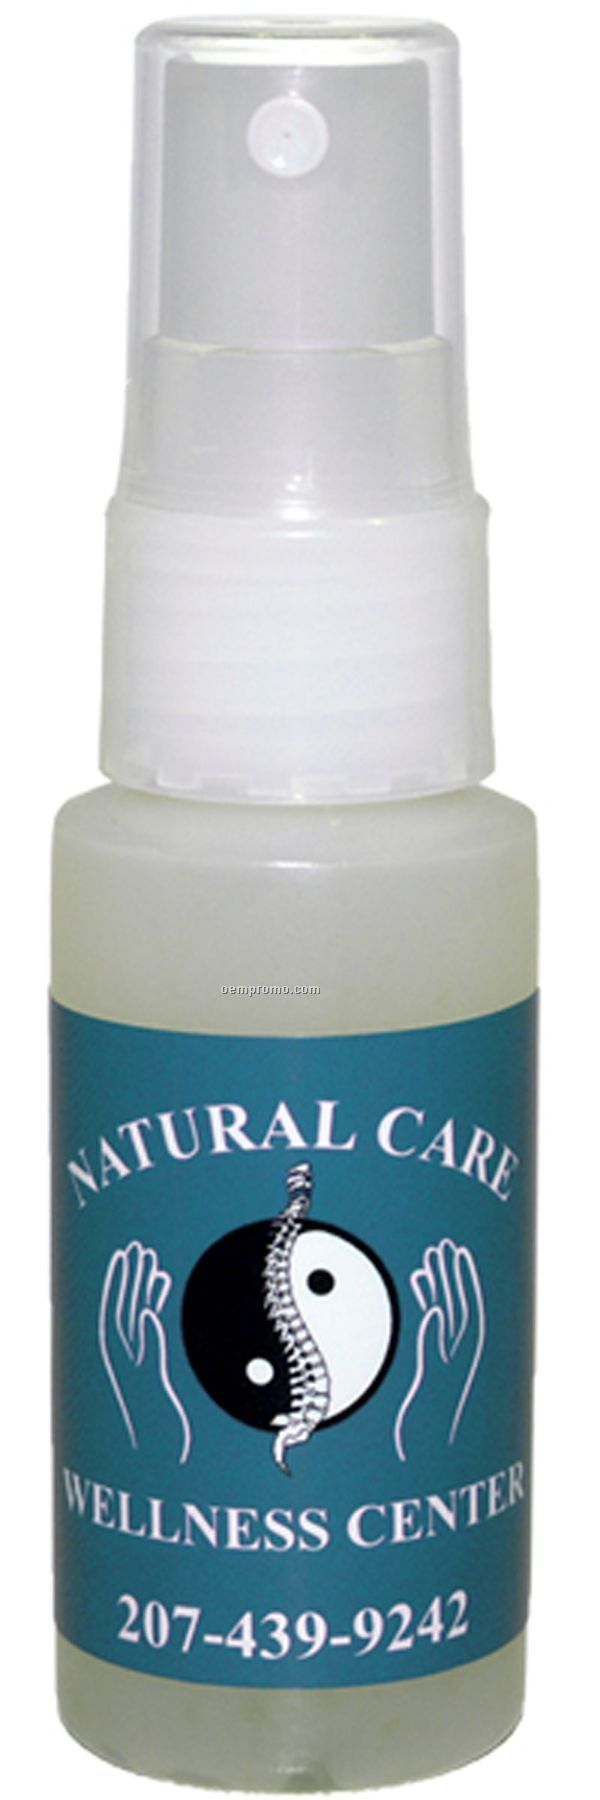 Aroma Fusion - Grapefruit & Clary Sage Fragrance Air Freshener